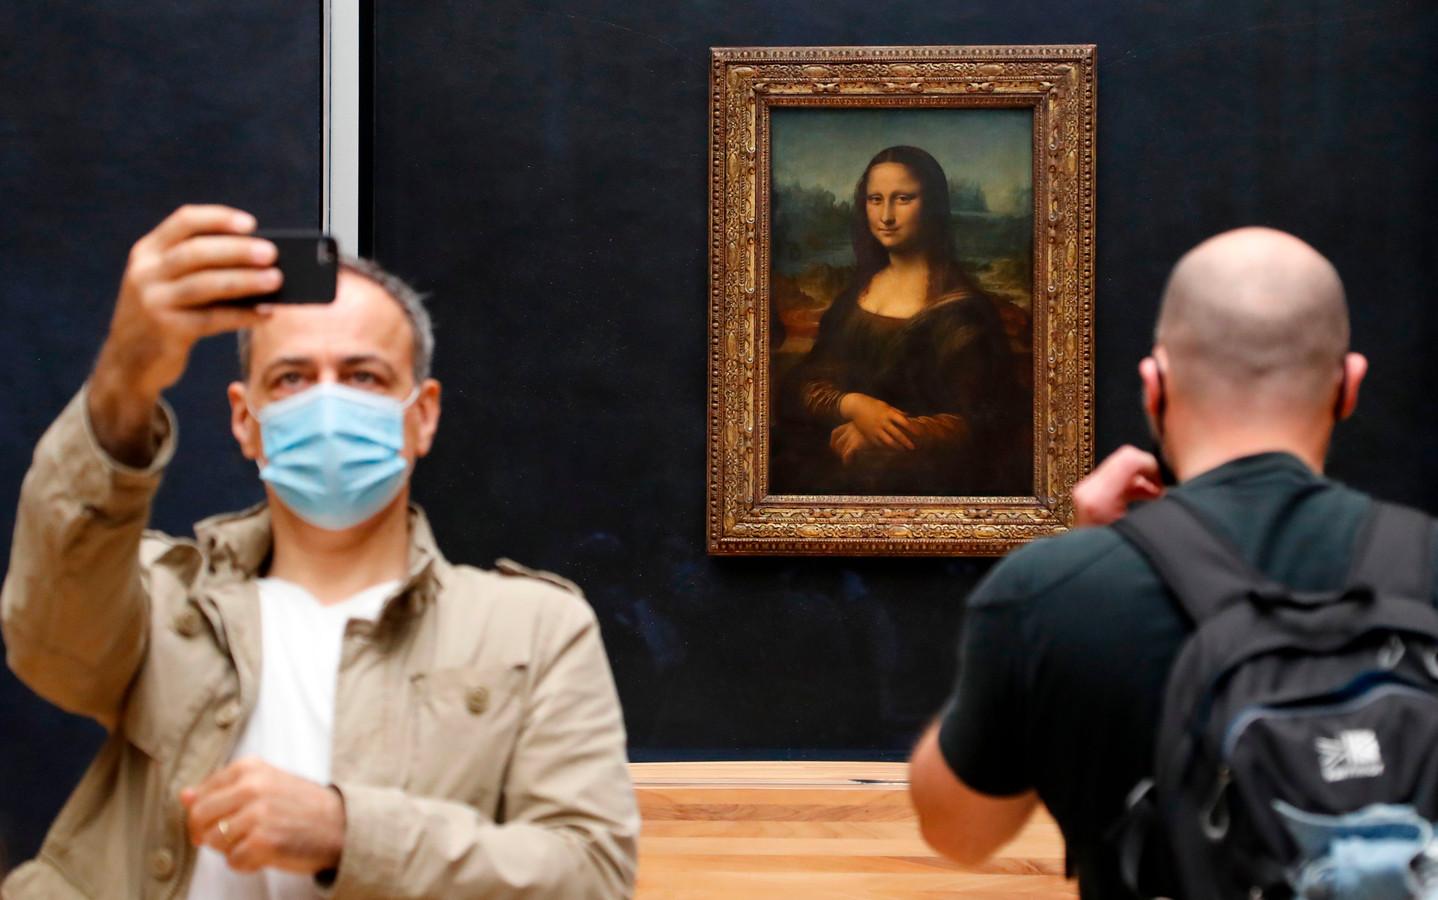 Leonardo da Vinci's meesterwerk Mona Lisa